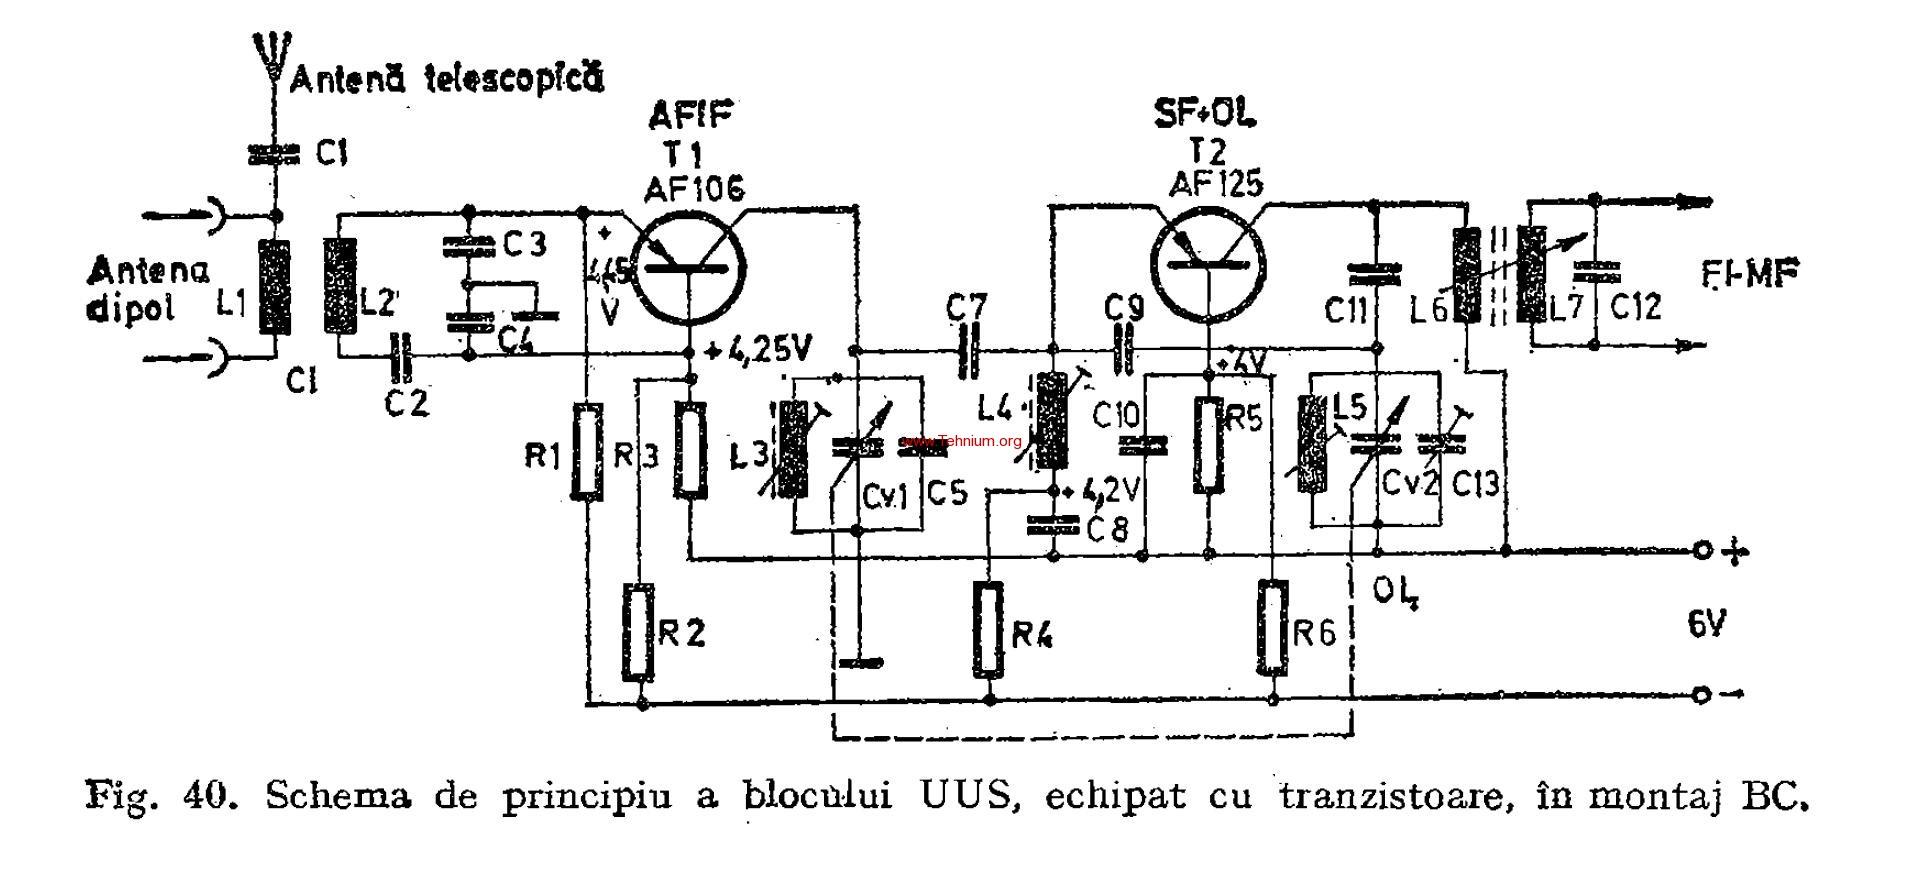 Blocul UUS, echipat eu tranzistoare 1